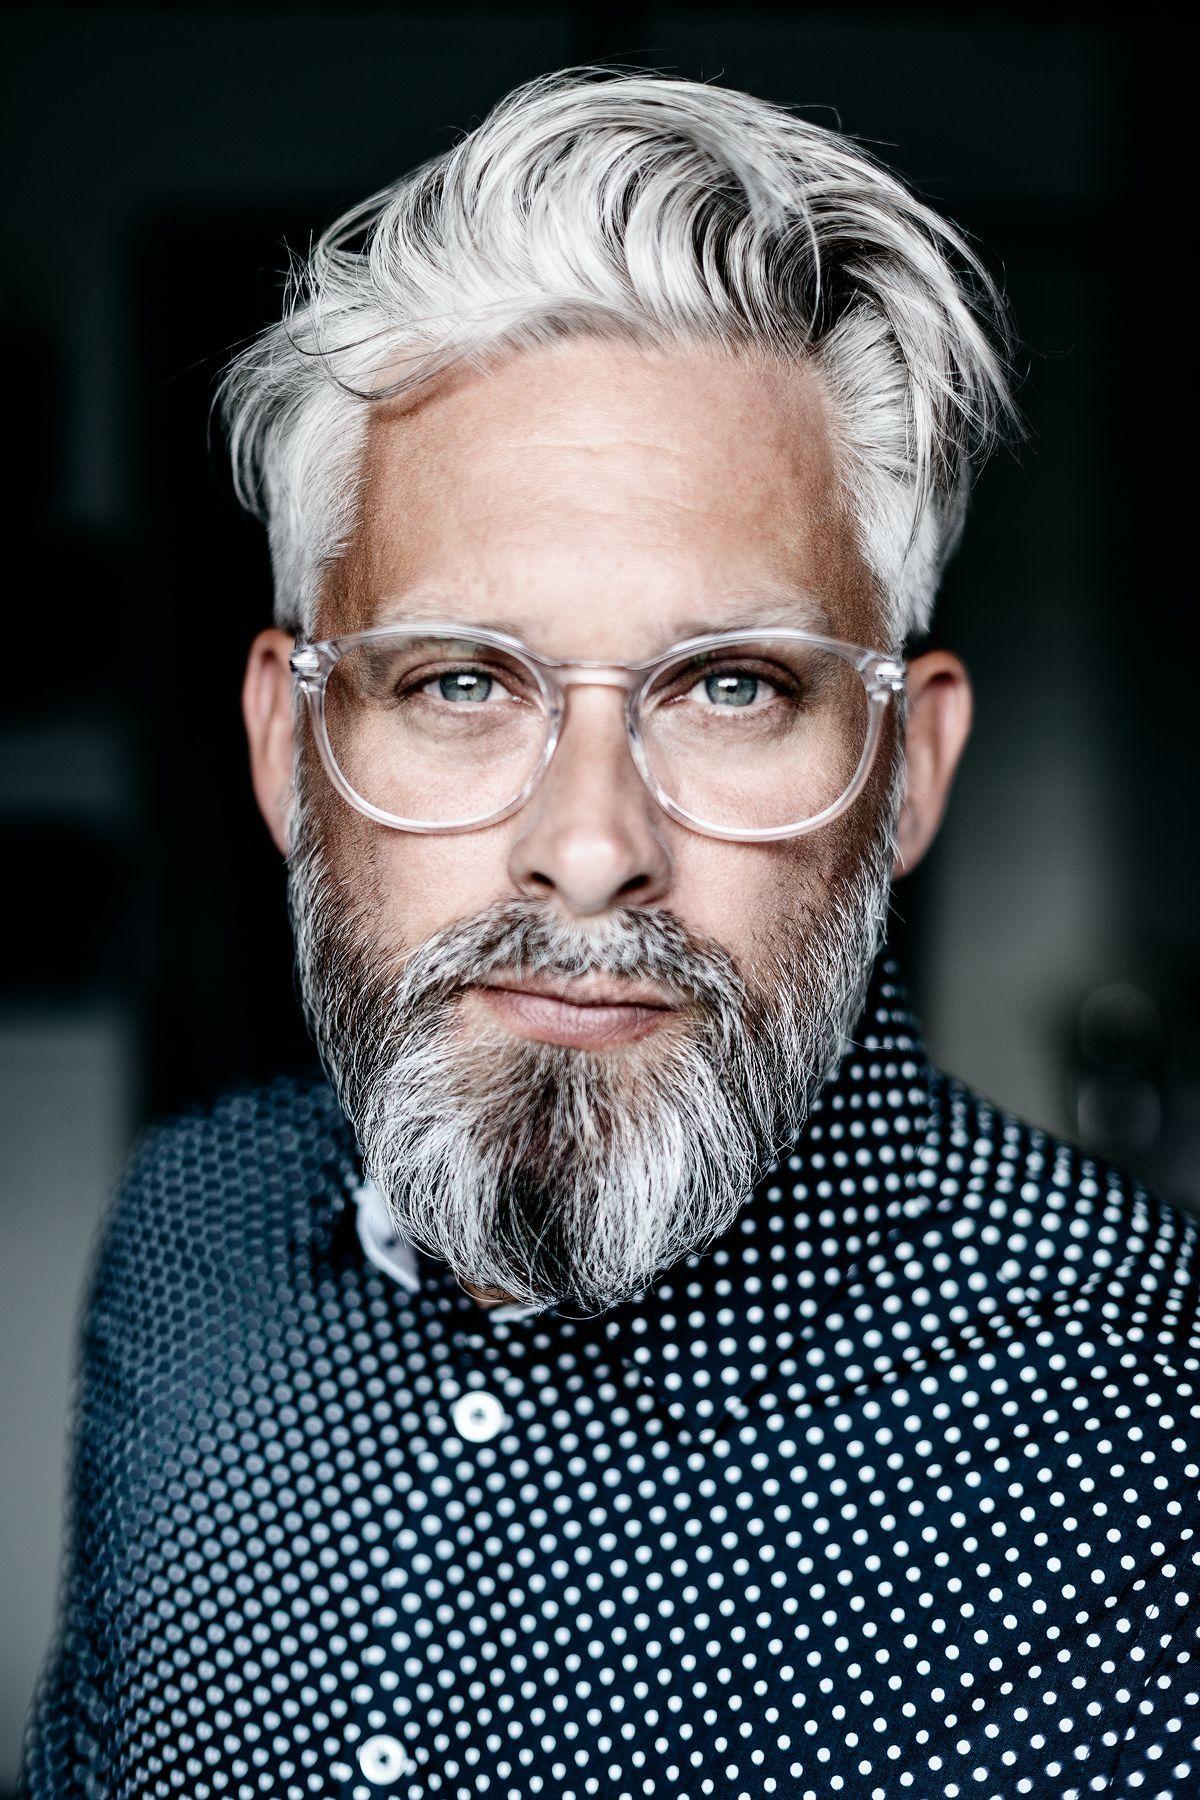 Photo of Beards